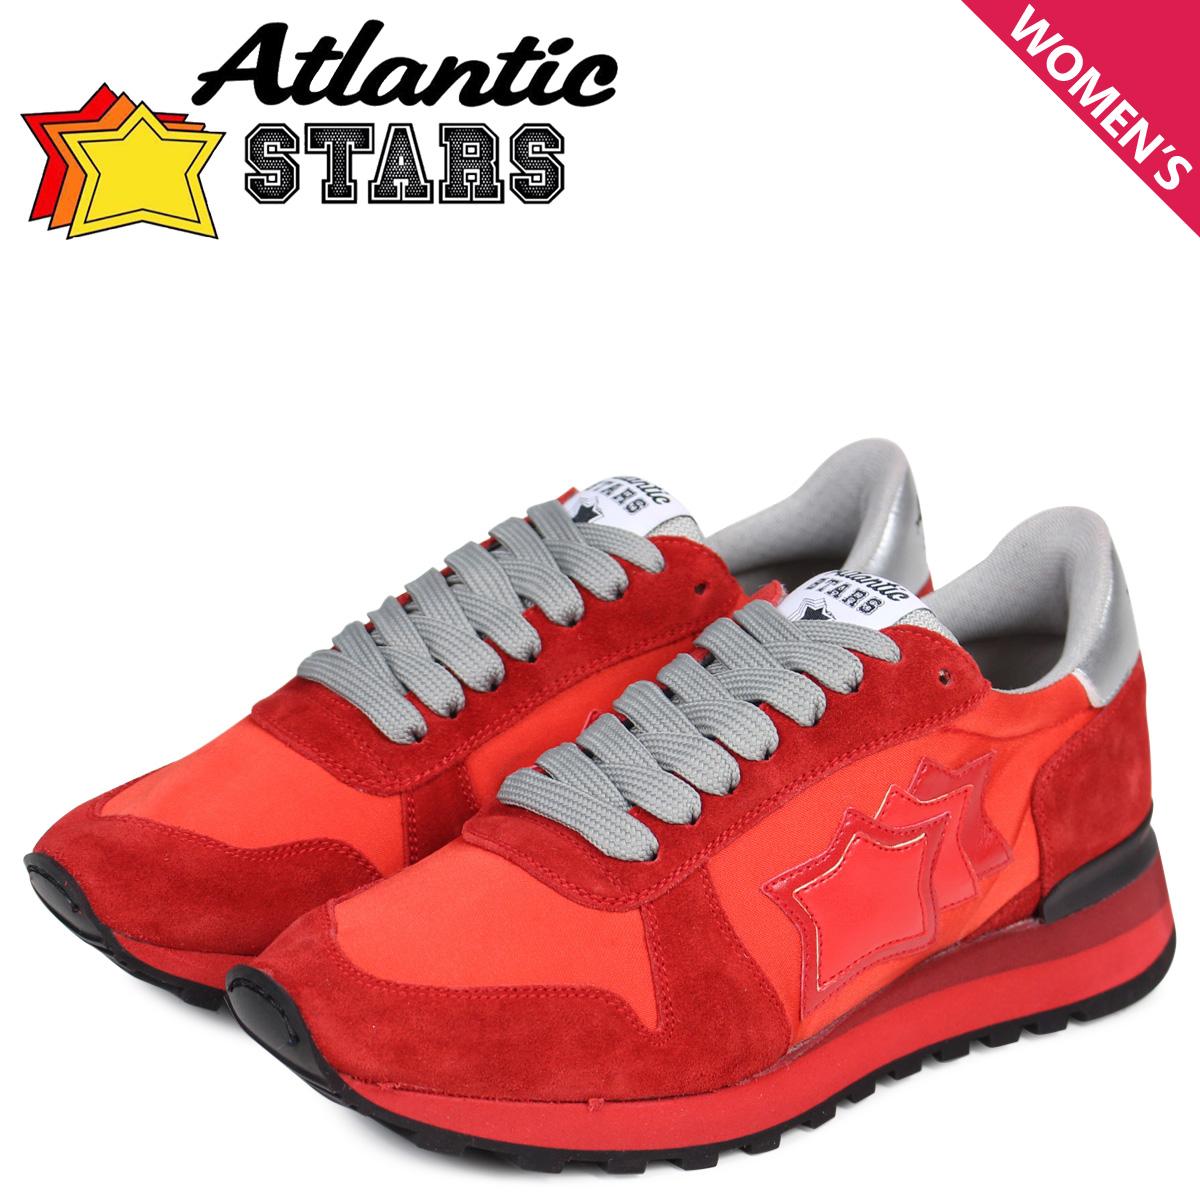 Atlantic STARS レディース スニーカー アトランティックスターズ アレナ ALHENA RFNYNRRN レッド 赤